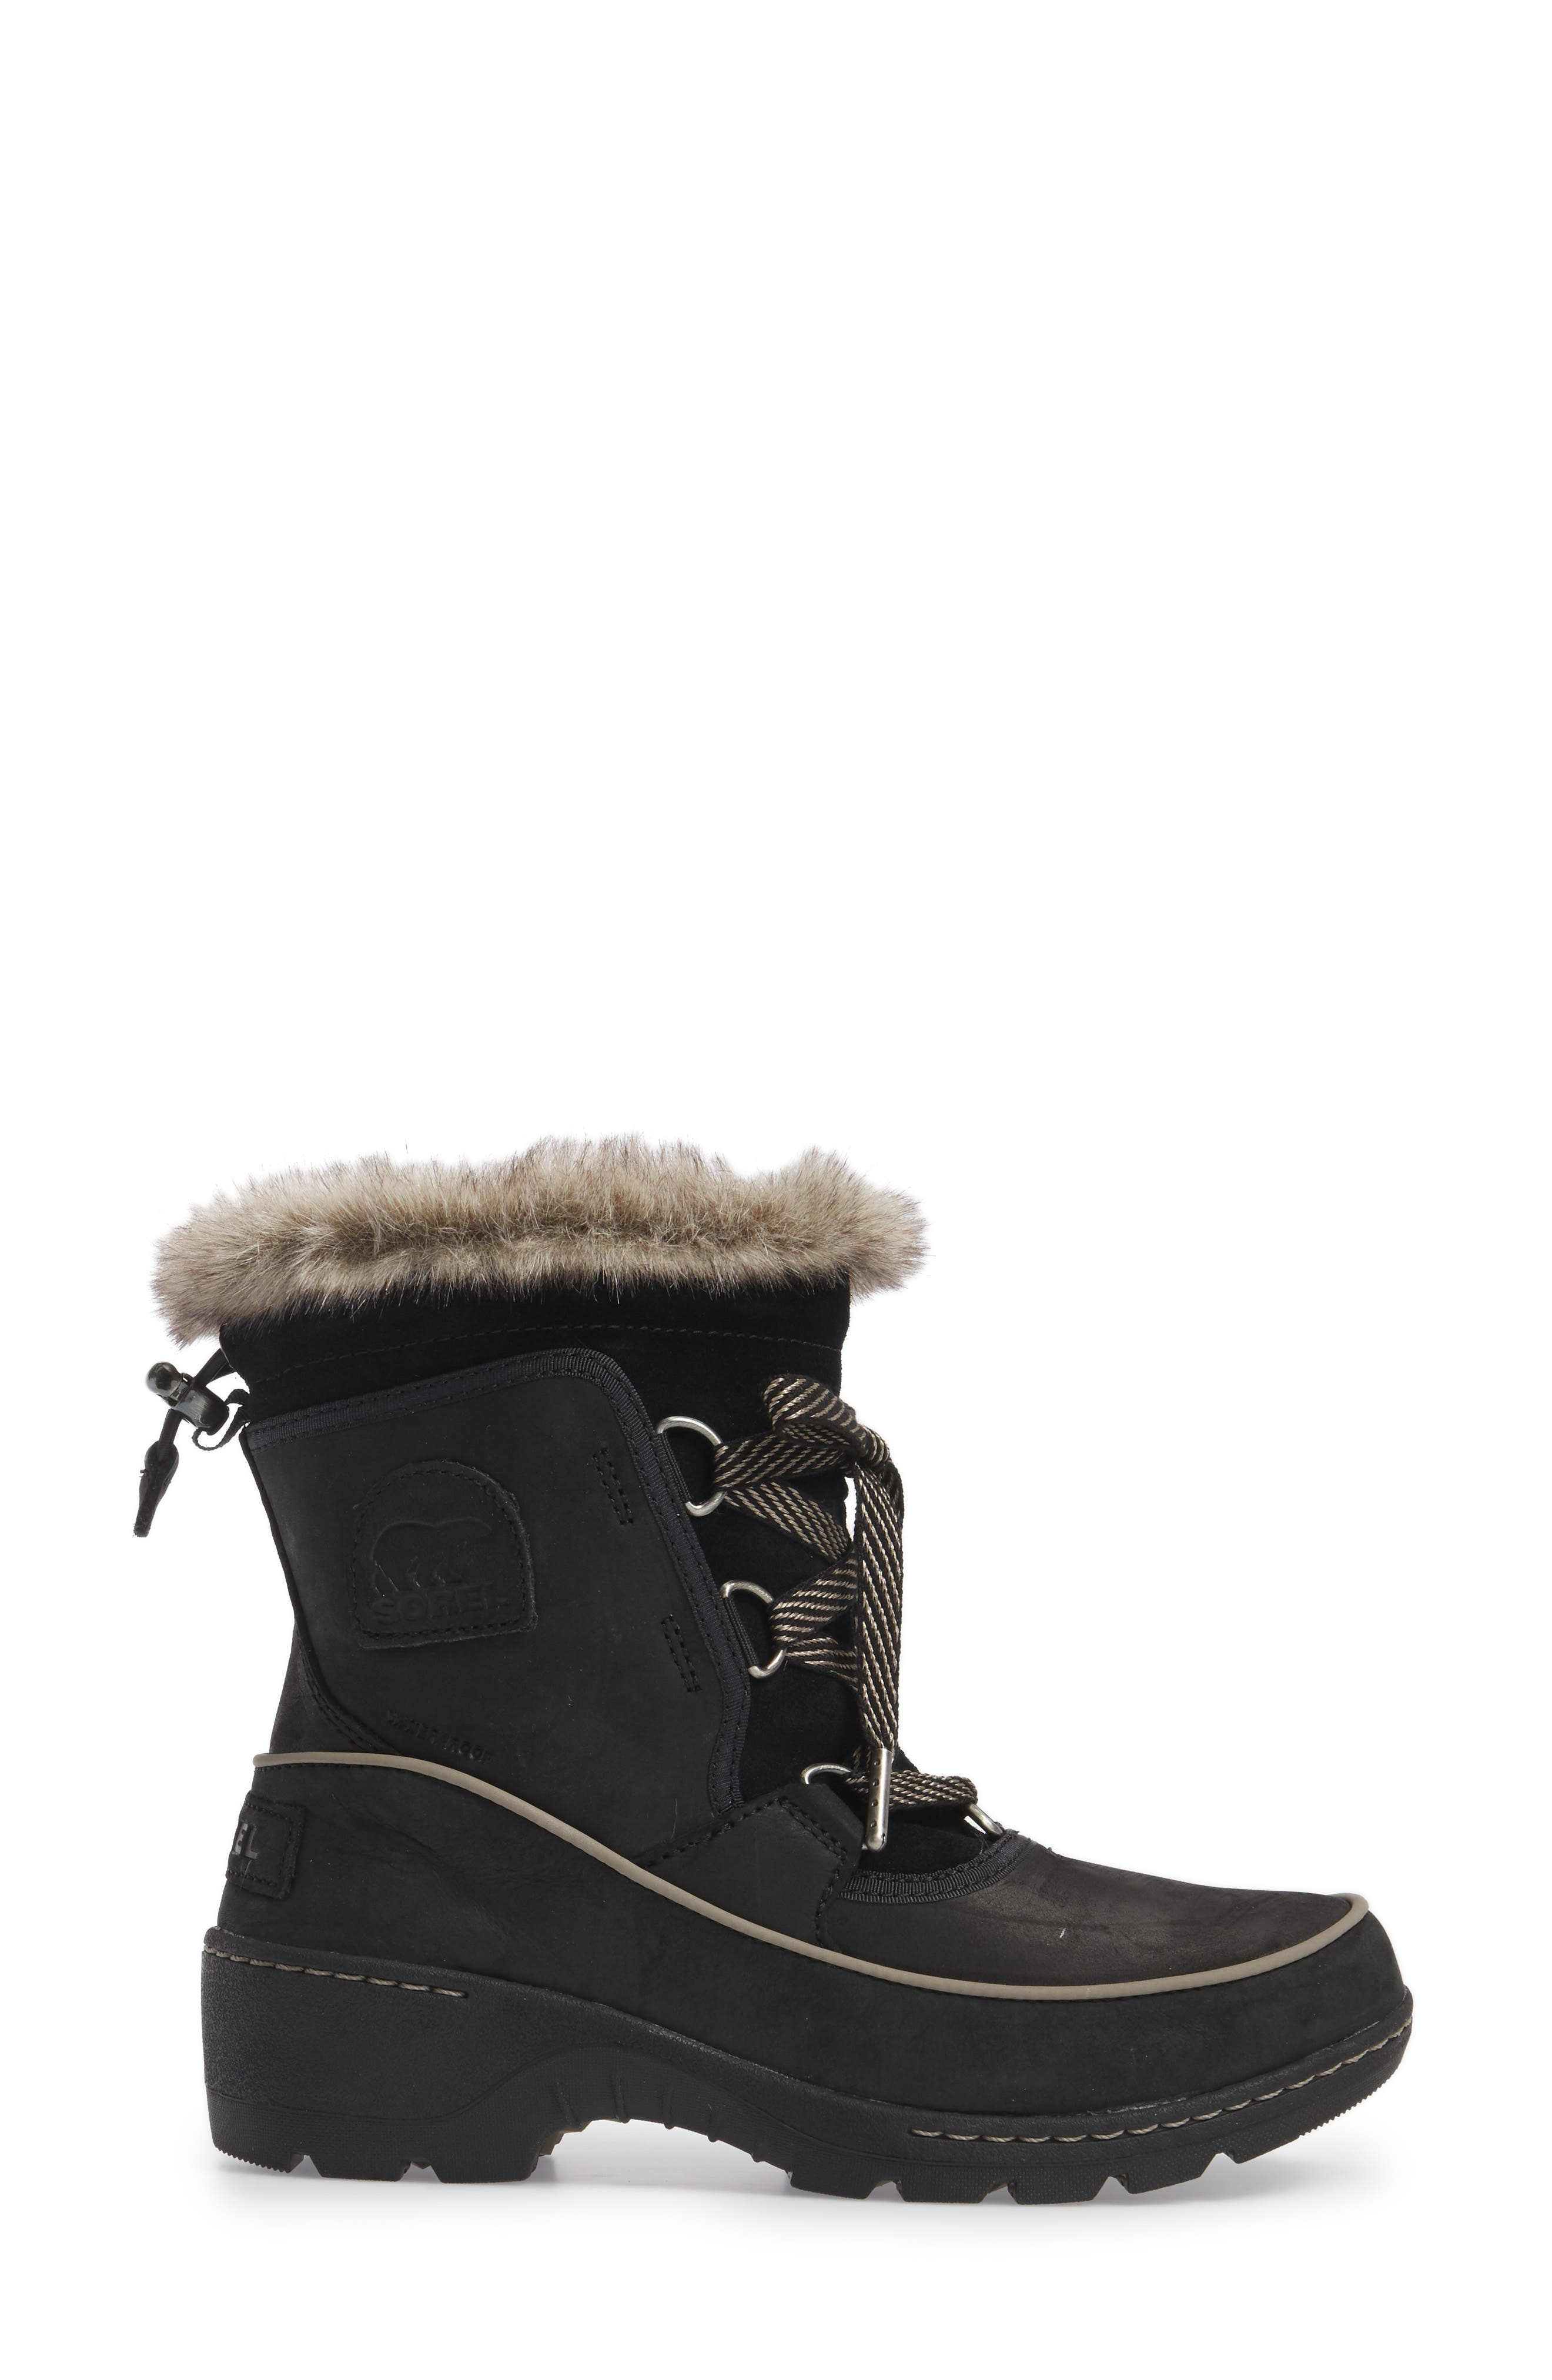 Alternate Image 3  - SOREL Tivoli II Insulated Winter Boot with Faux Fur Trim (Women)